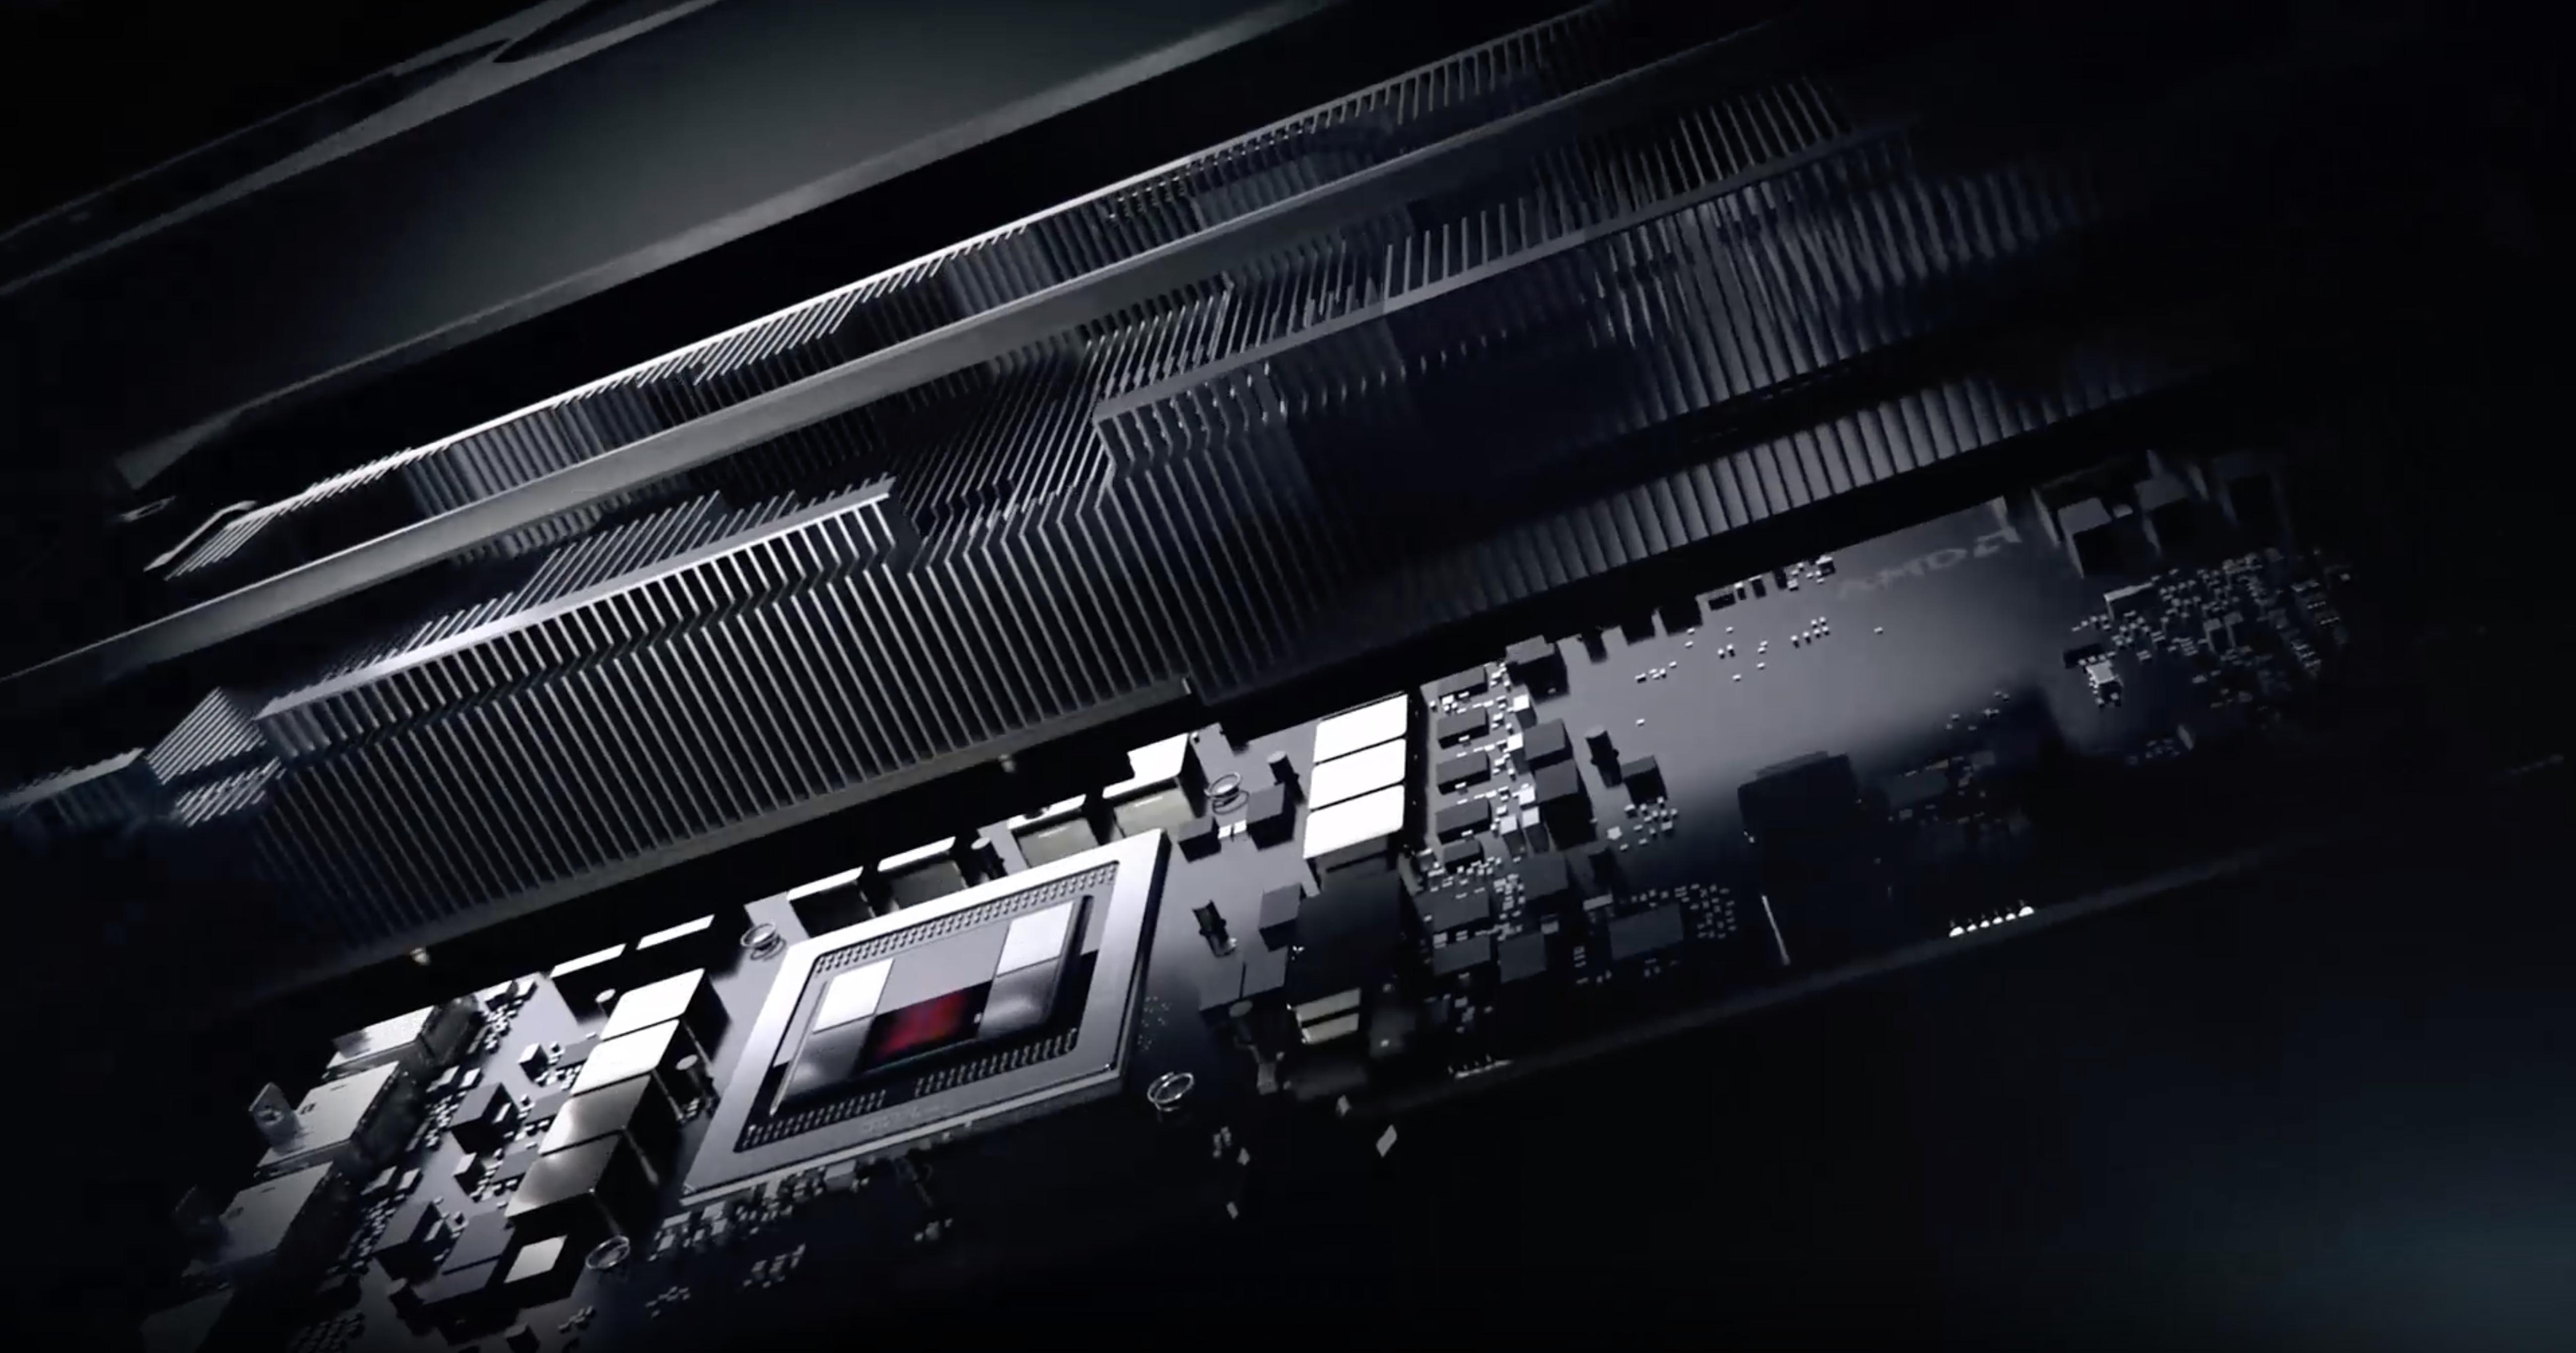 Meet the AMD Radeon VII - The AMD Radeon VII Review: An